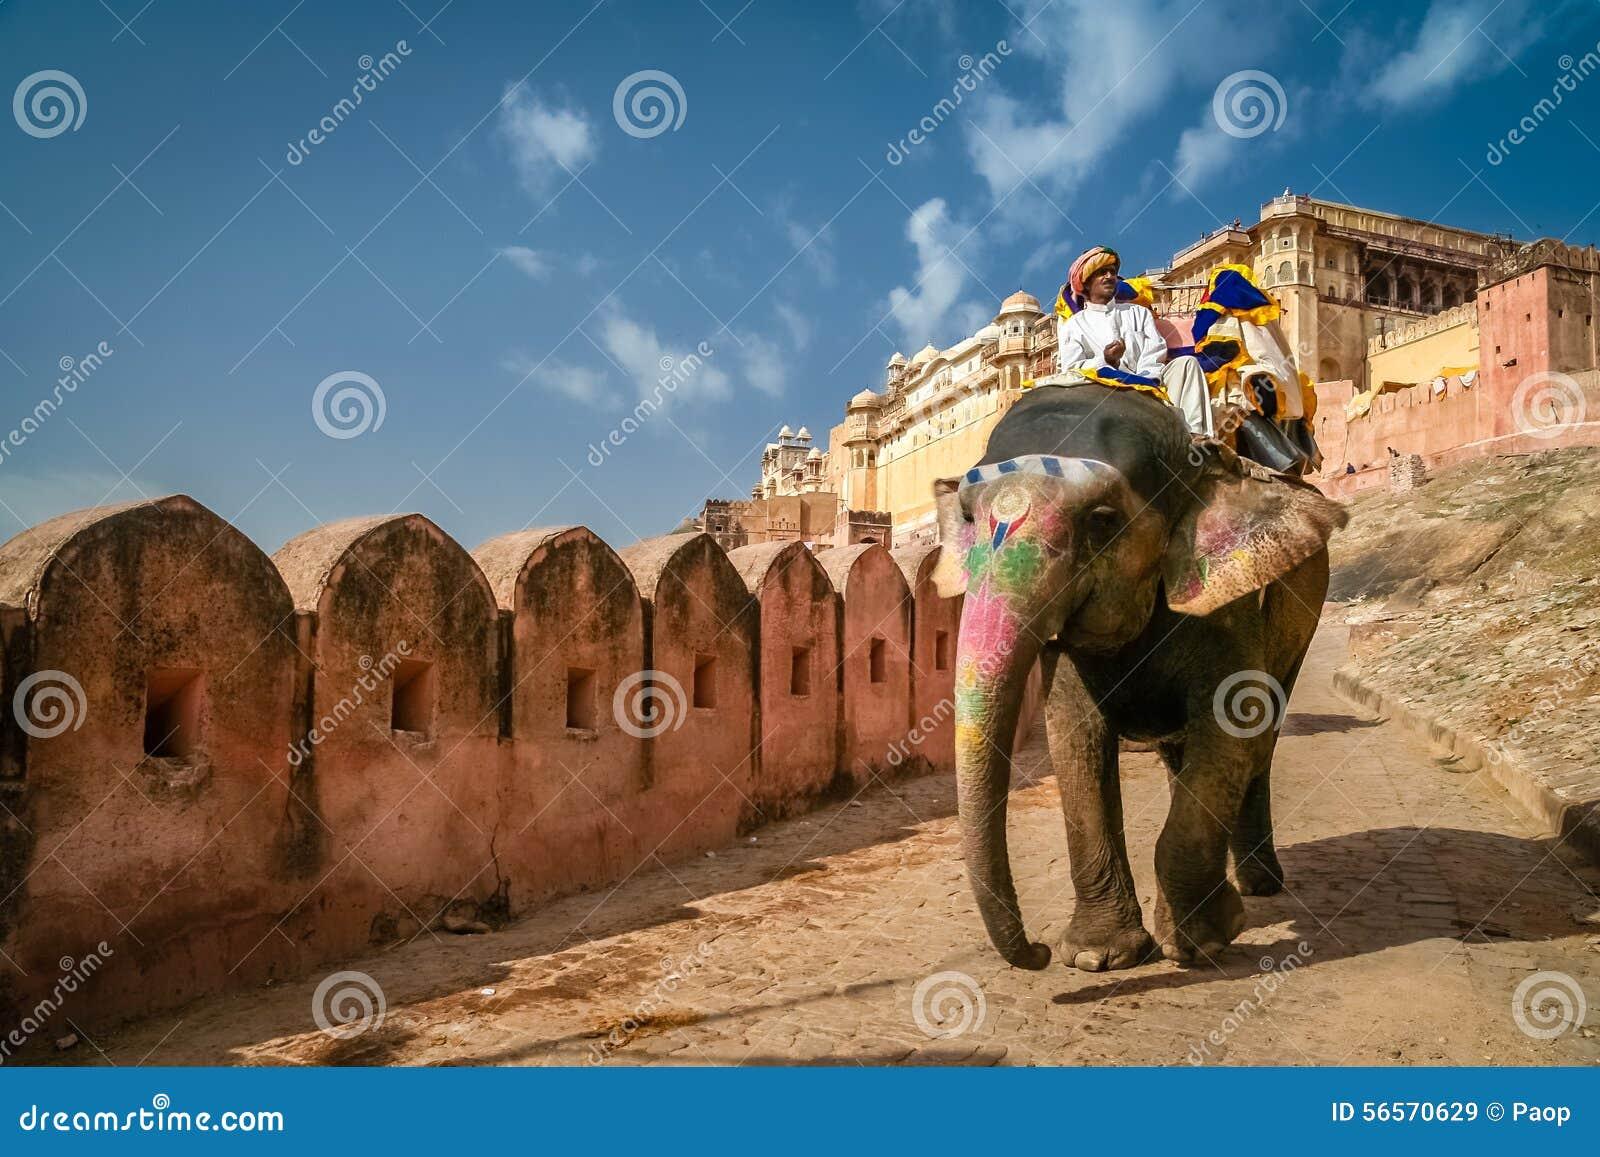 Download Τουρίστες στον ελέφαντα εκδοτική στοκ εικόνα. εικόνα από ενισχυμένος - 56570629